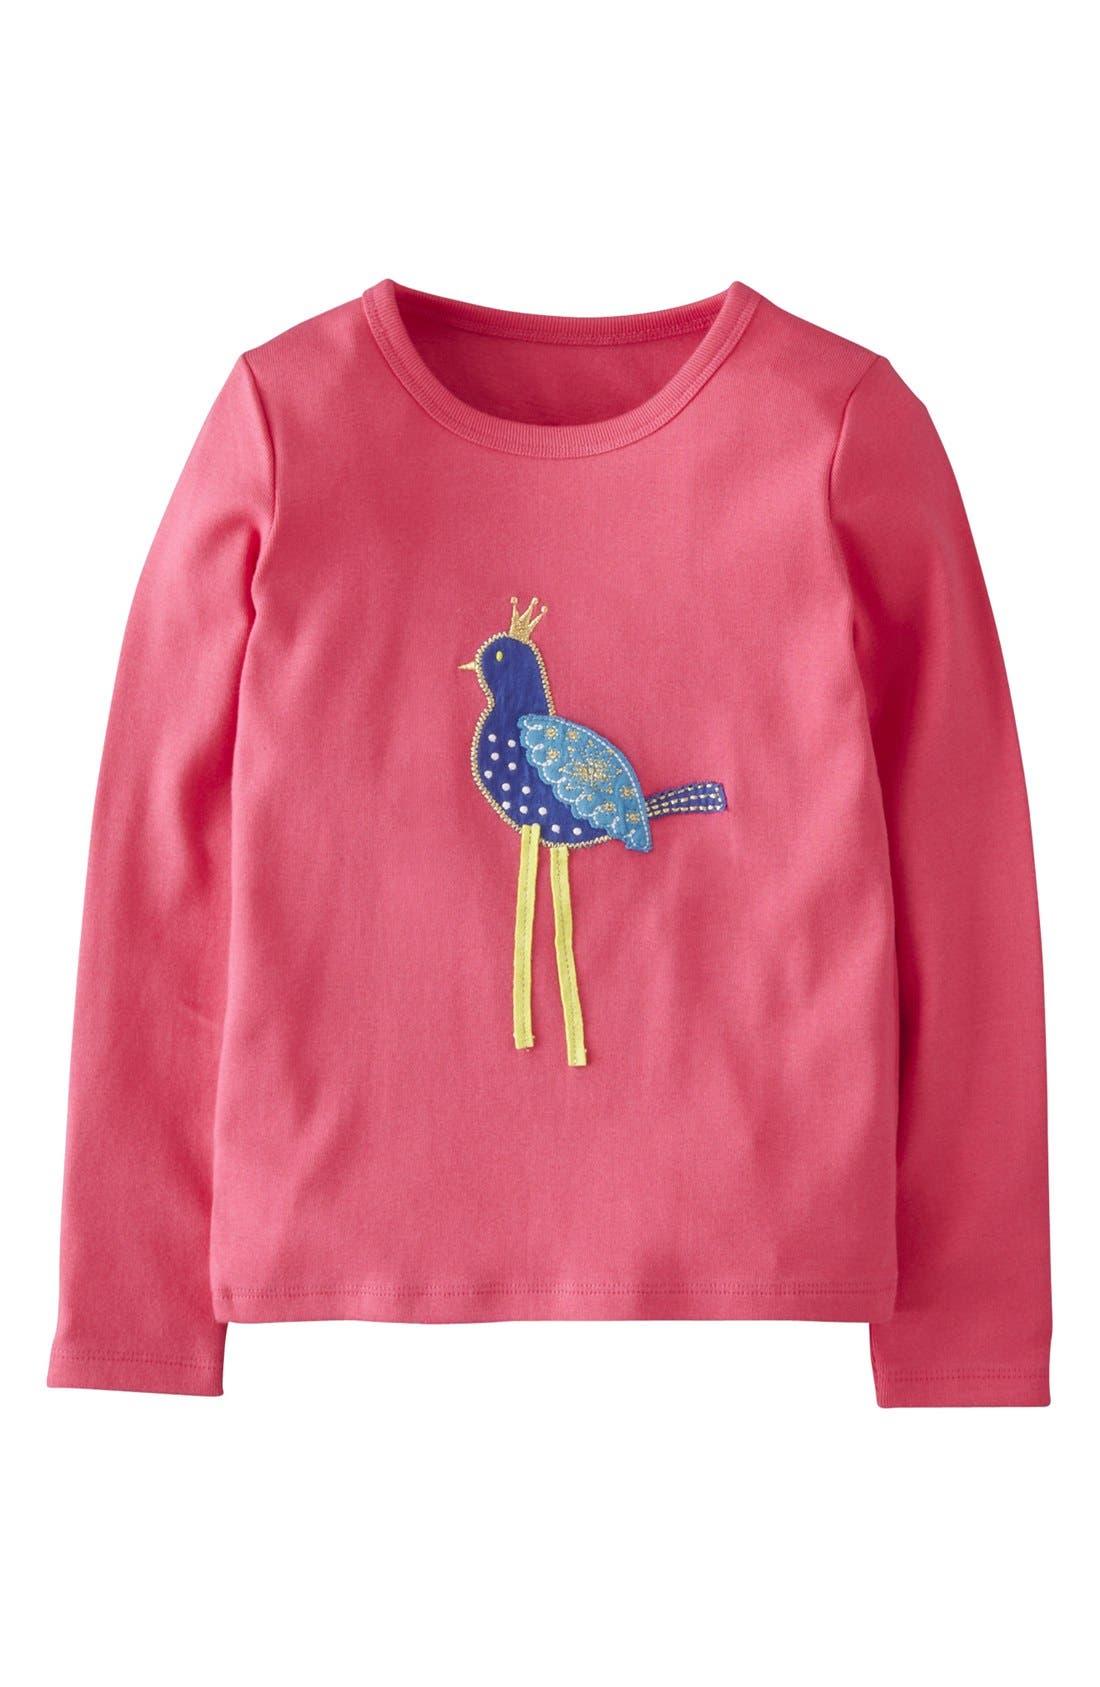 Alternate Image 1 Selected - Mini Boden Appliqué Long Sleeve Tee (Toddler Girls, Little Girls & Big Girls)